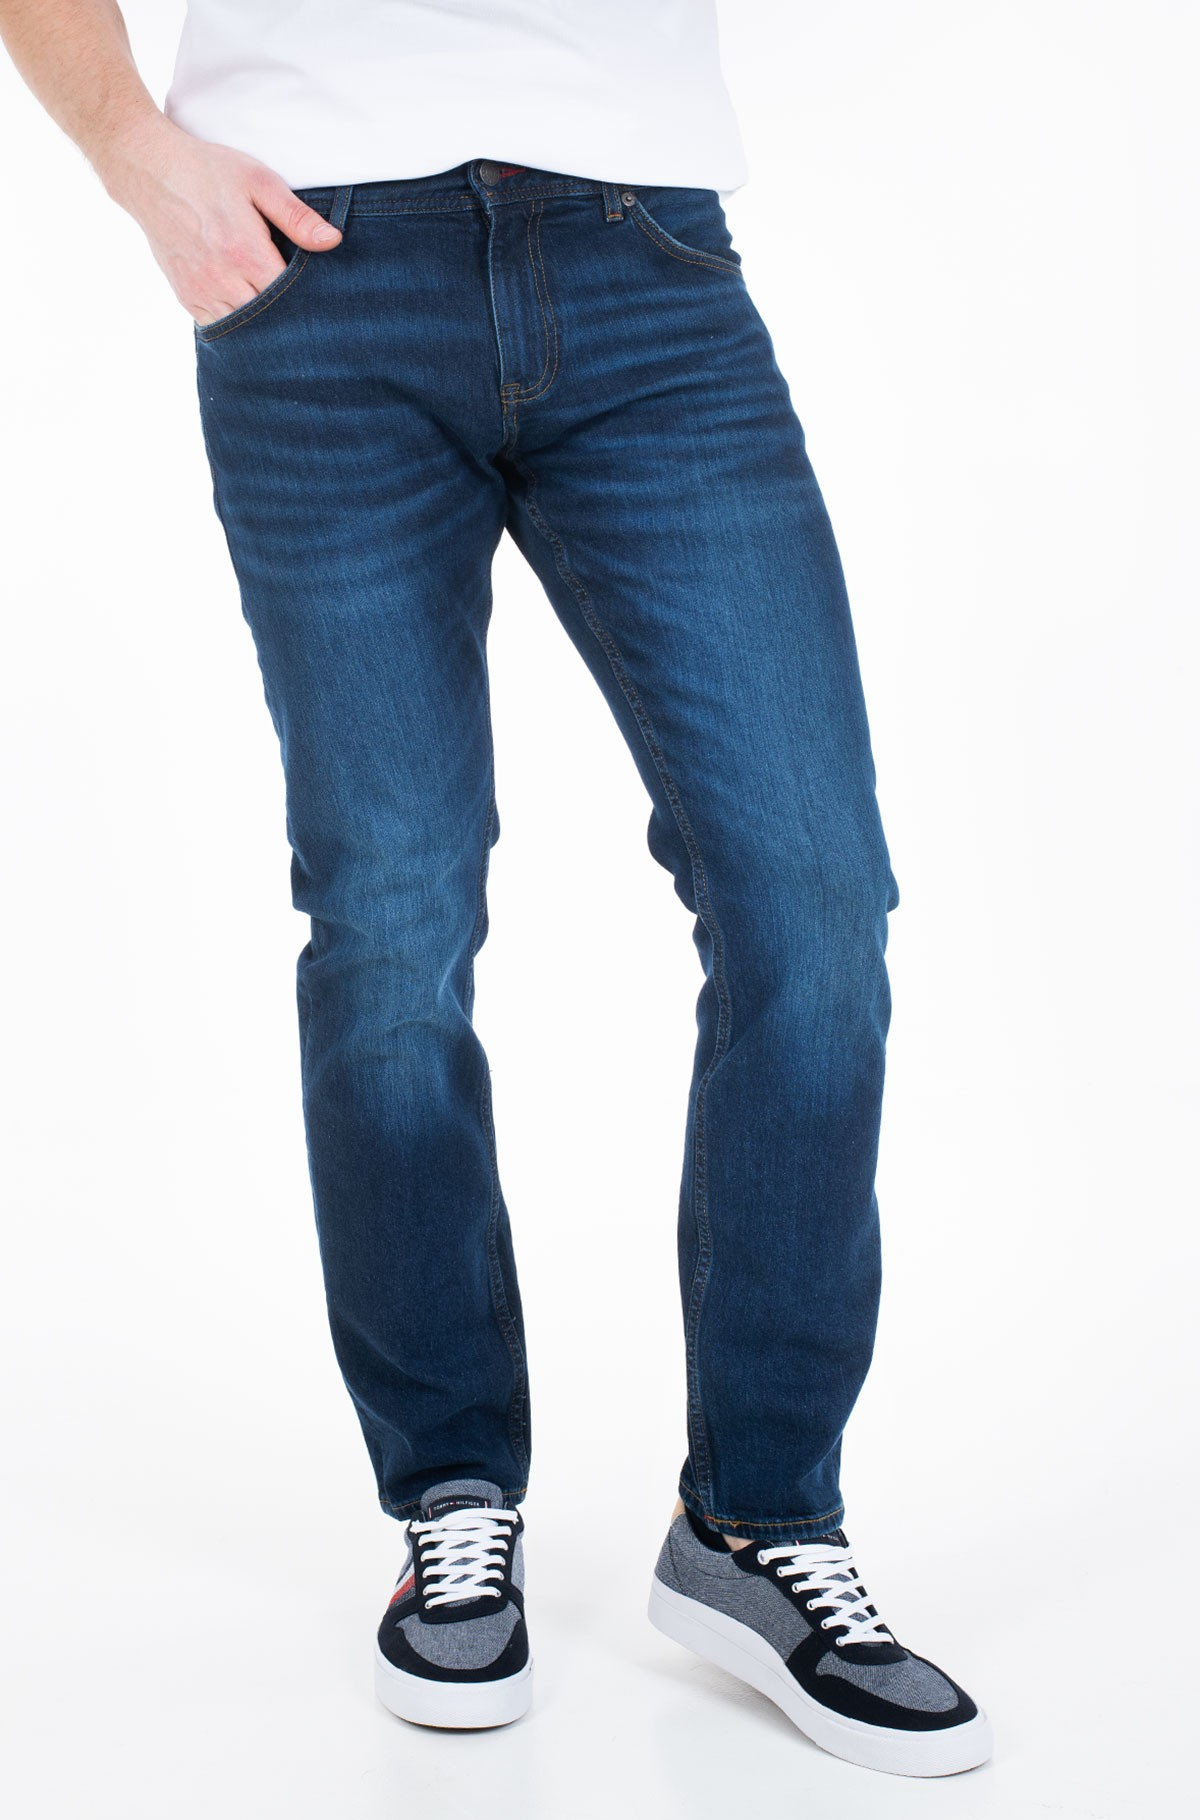 Džinsinės kelnės SLIM BLEECKER STR BOWIE BLUE-full-1